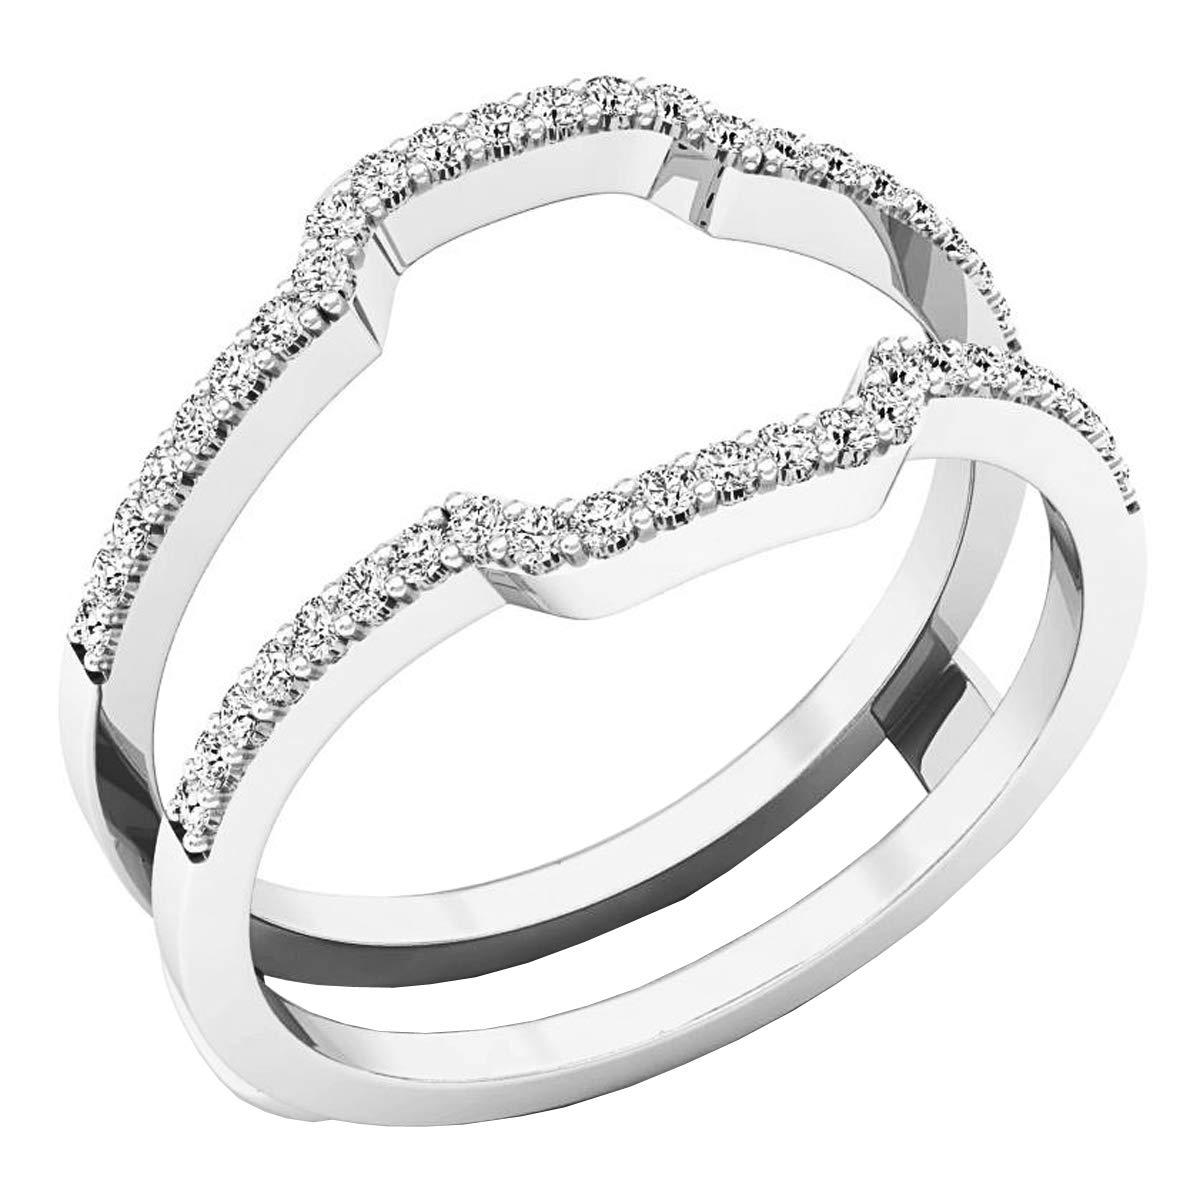 Dazzlingrock Collection 0.25 Carat (ctw) 10K White Diamond Wedding Band Enhancer Guard Ring 1/4 CT, White Gold, Size 7.5